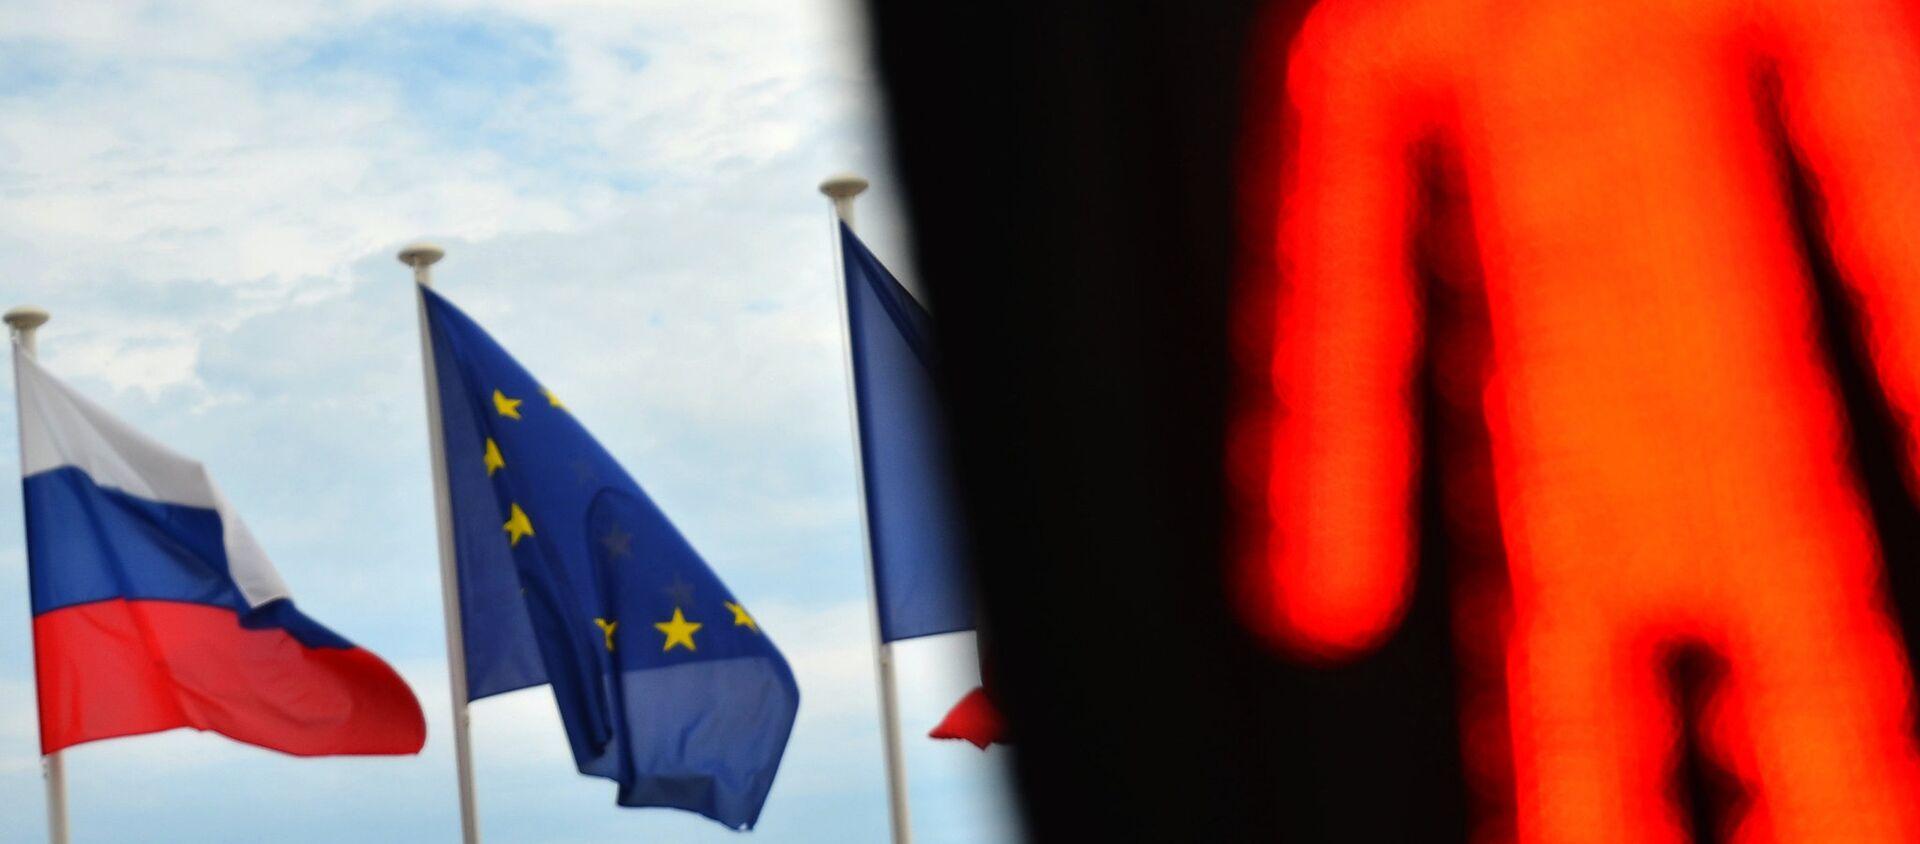 Флаги России, ЕС и Франции - Sputnik Беларусь, 1920, 23.02.2021